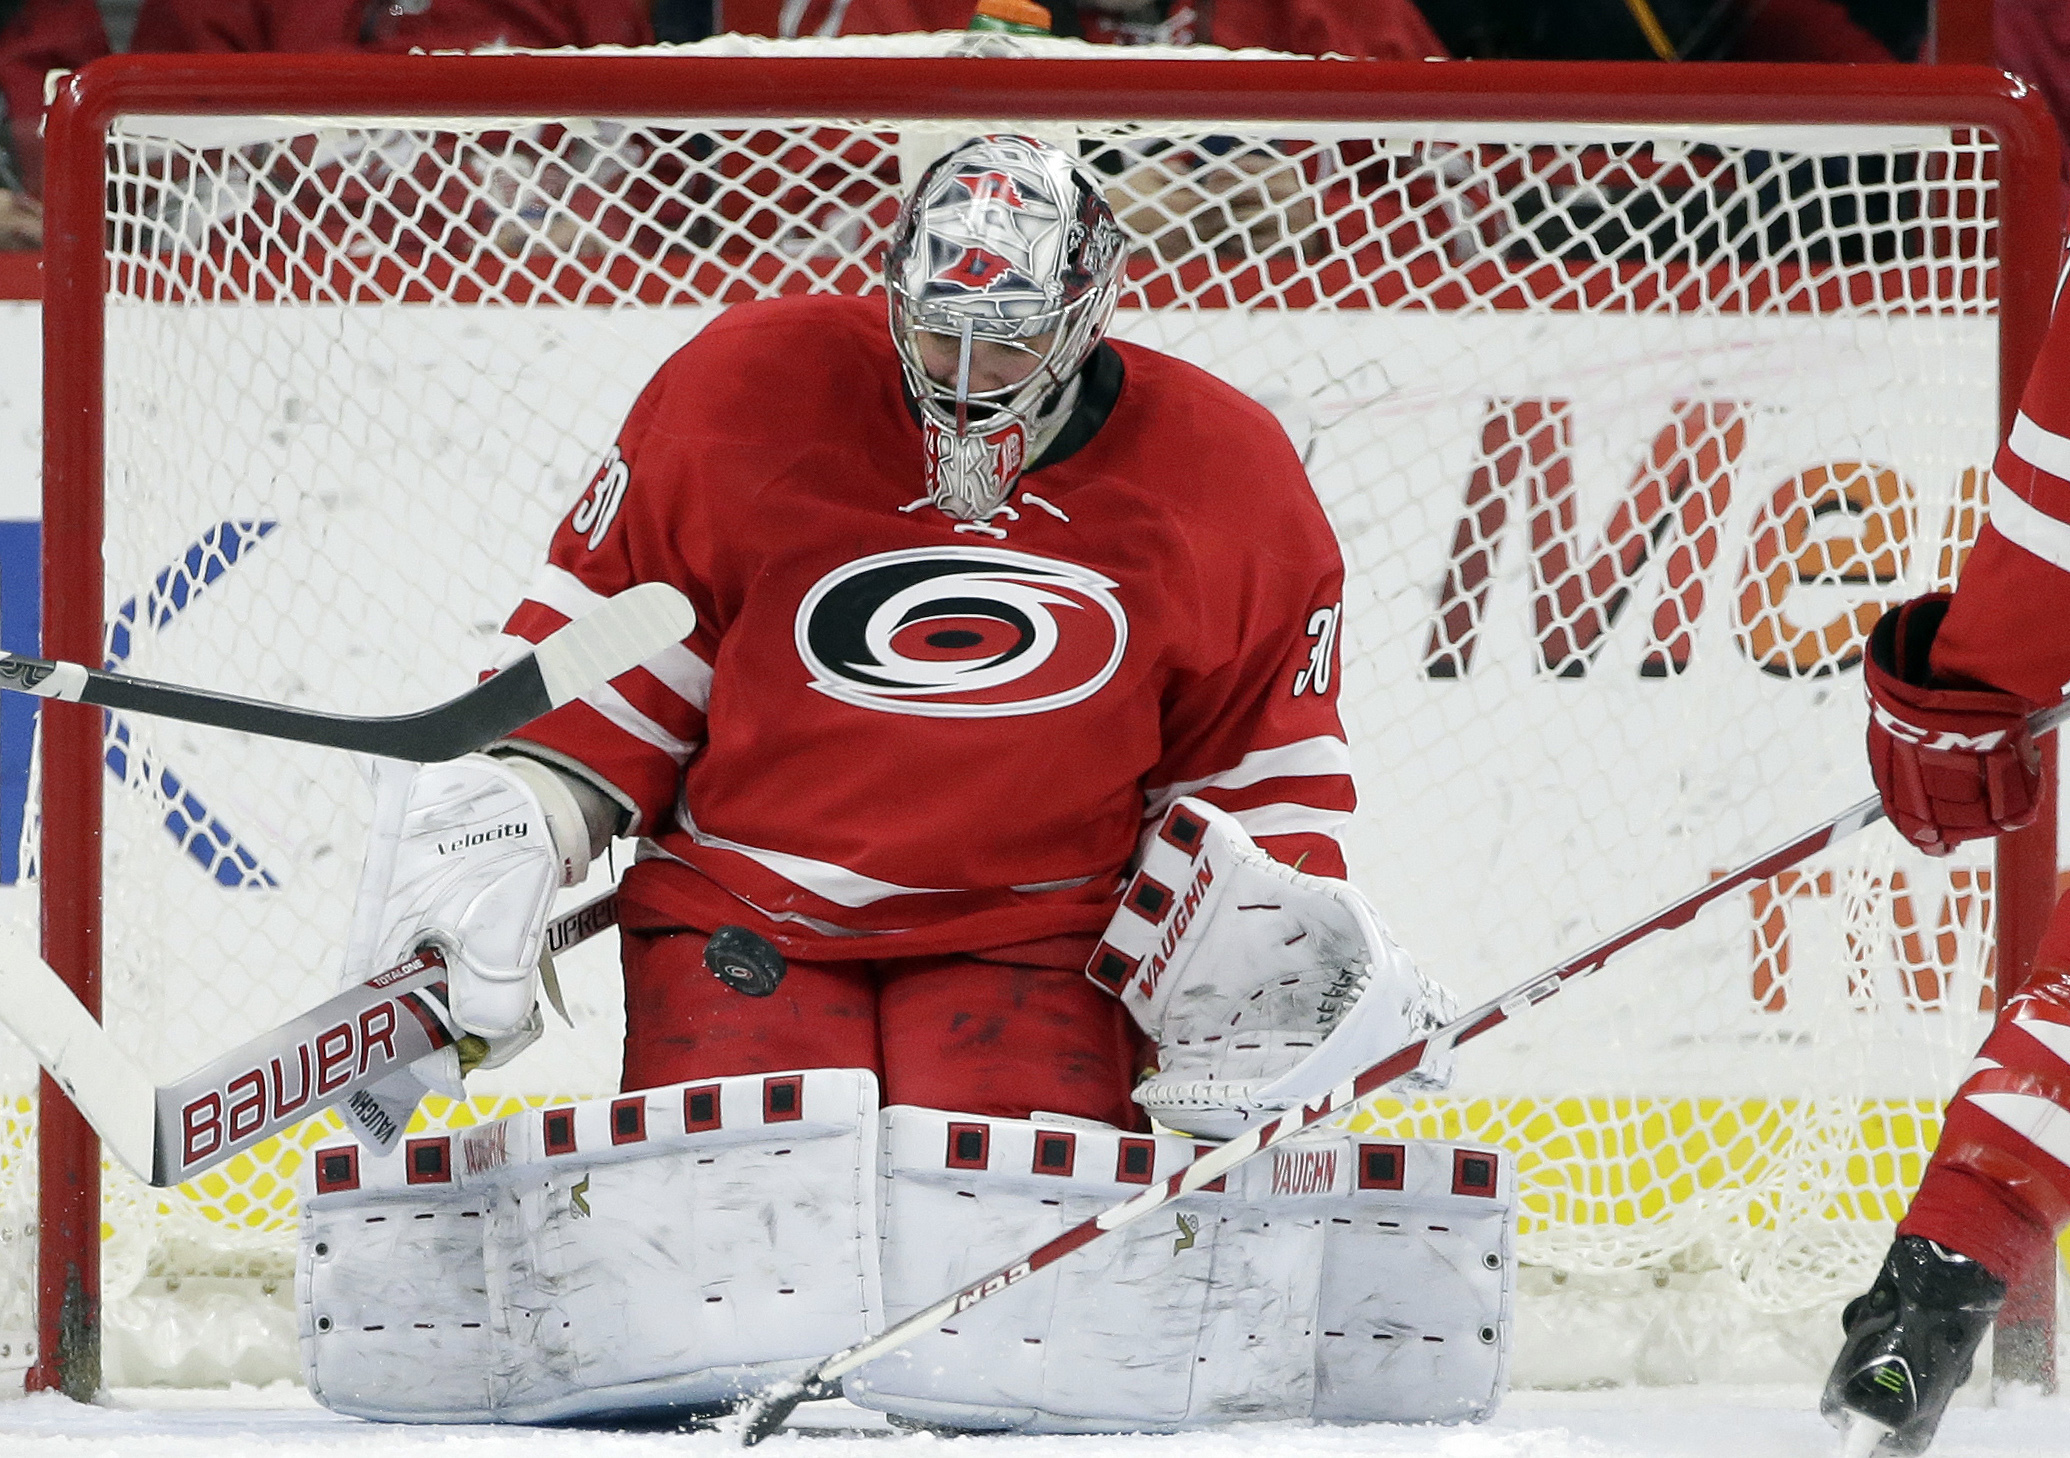 Carolina Hurricanes goalie Cam Ward blocks a Boston Bruisn shot during the second period of an NHL hockey game in Raleigh, N.C., Friday, Feb. 26, 2016. (AP Photo/Gerry Broome)